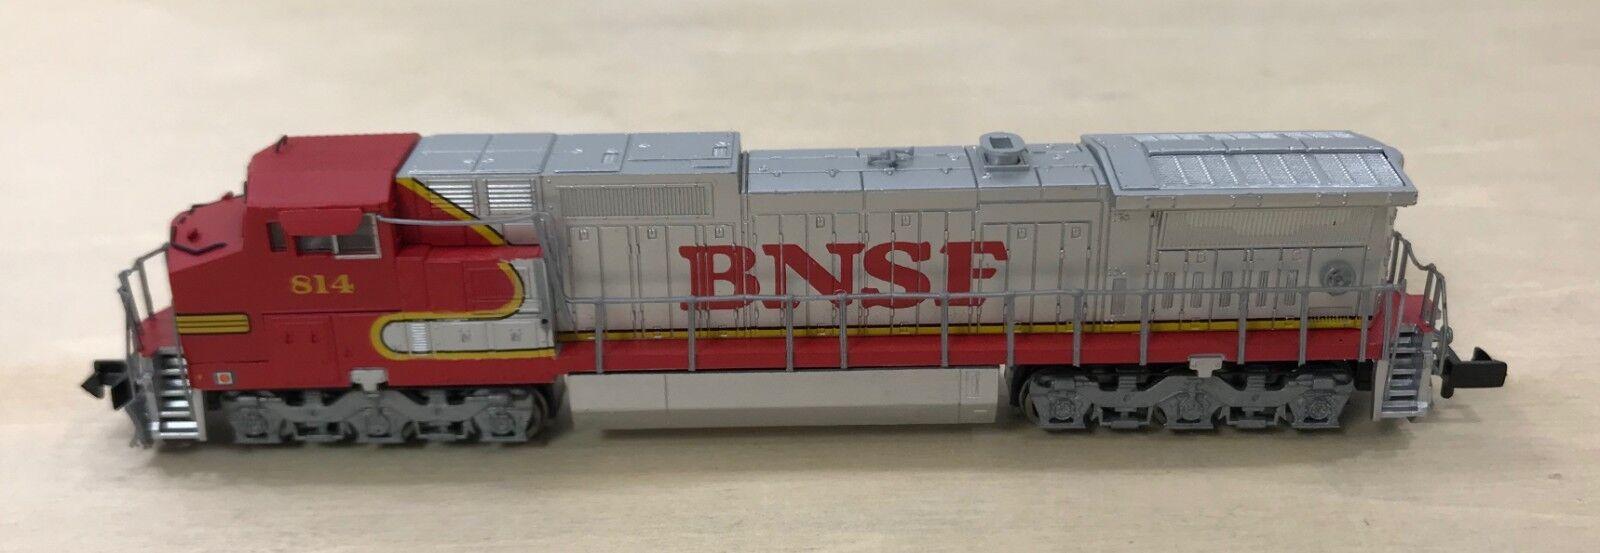 N Scale Bachmann Spectrum GE Dash 8-40CW Diesel Locomotive - BNSF